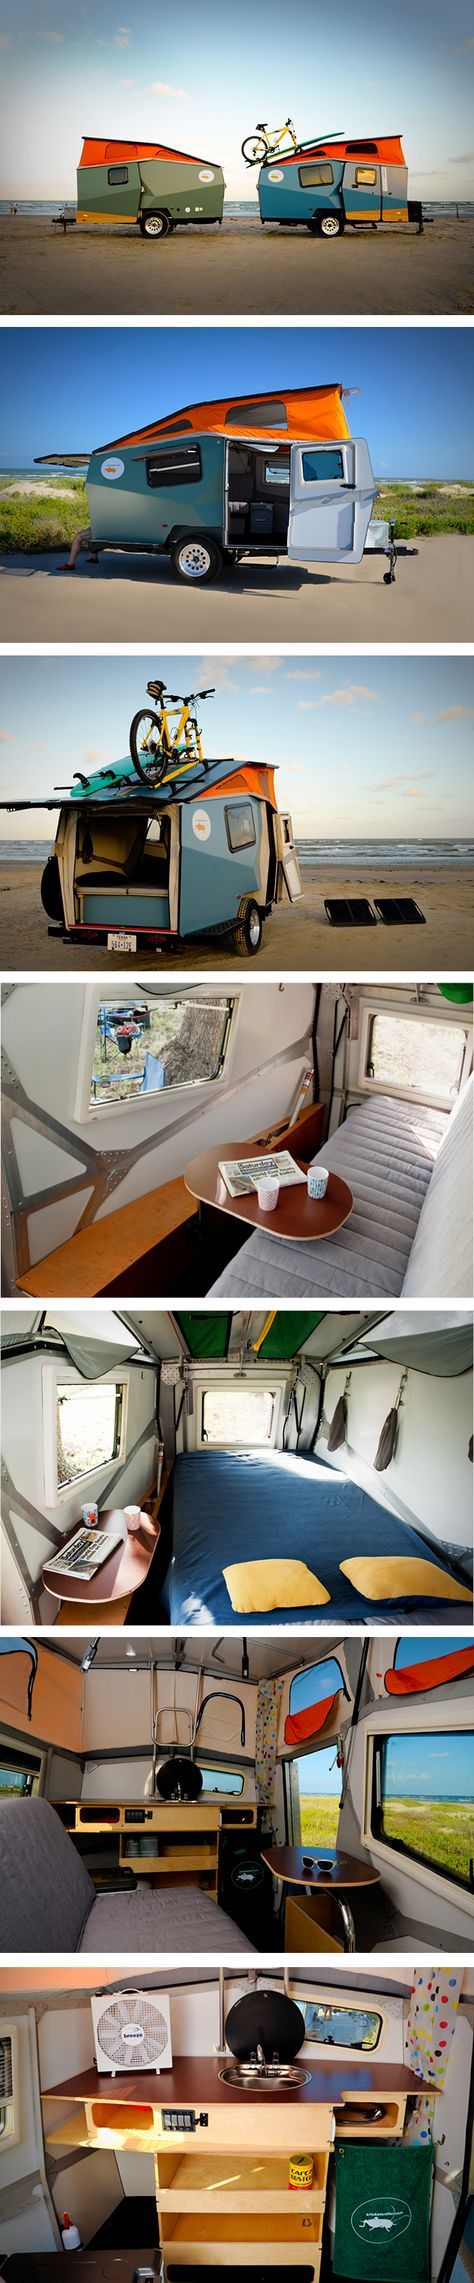 Cricket camper trailer